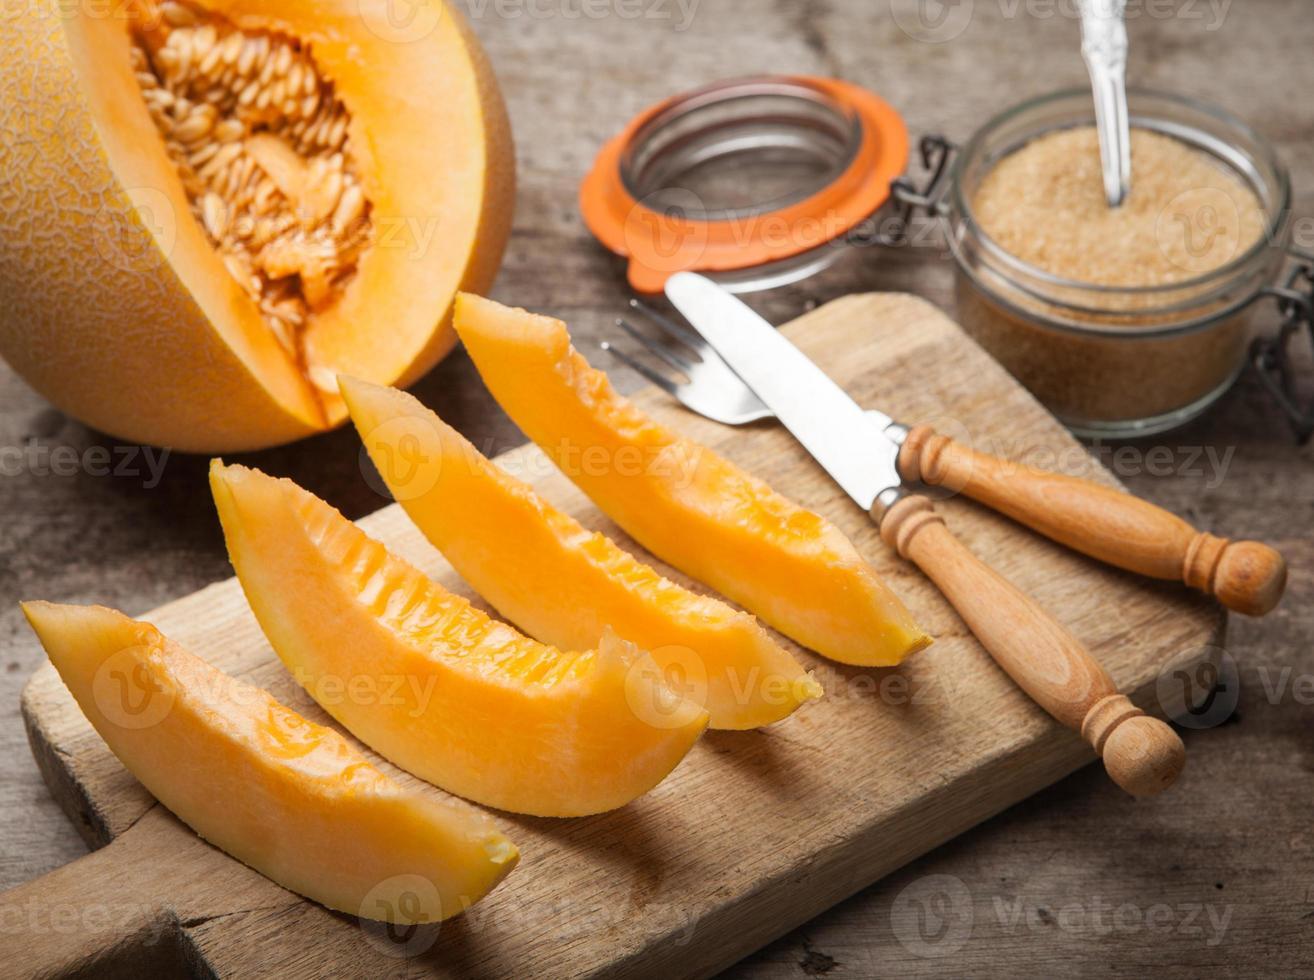 melon cantaloup photo